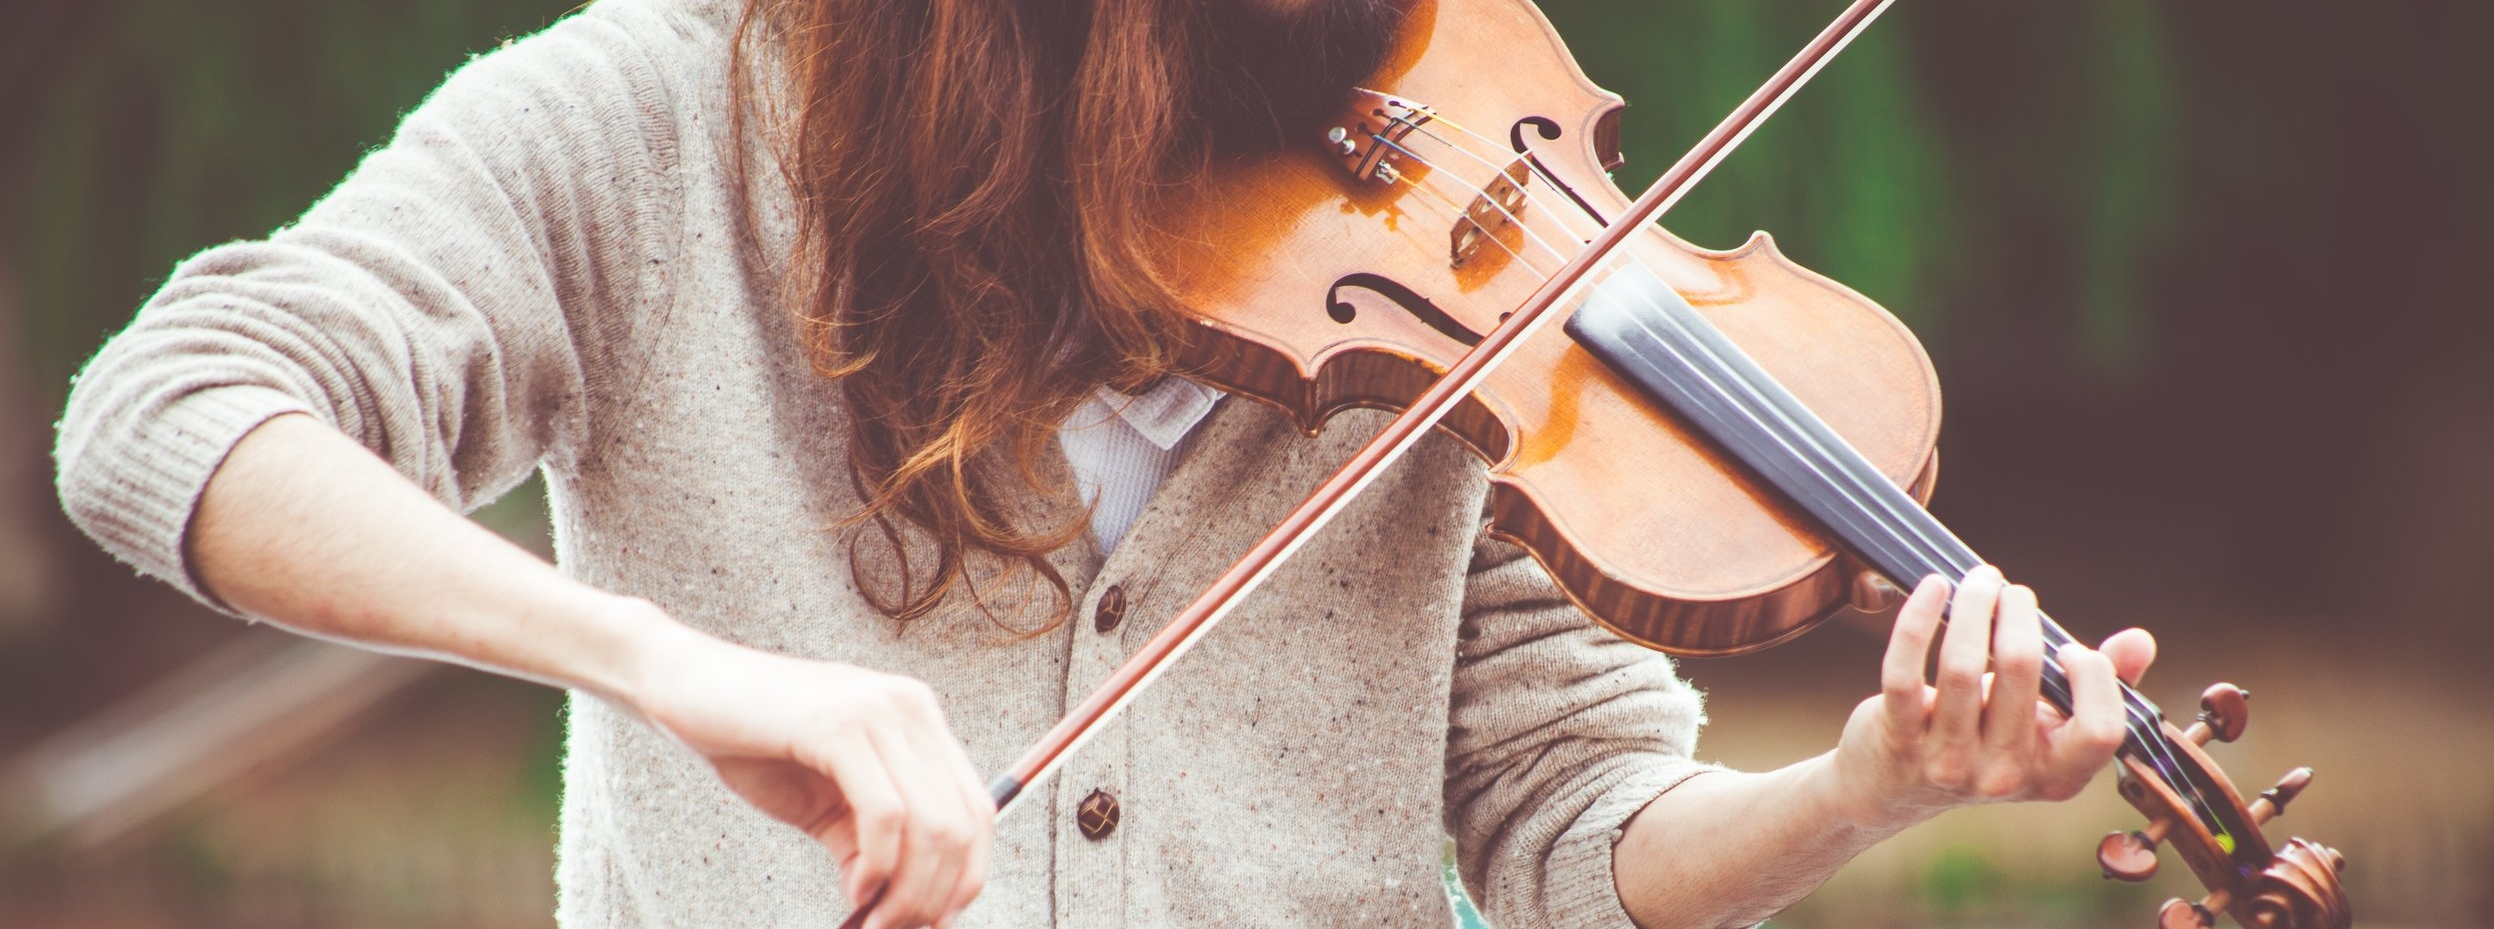 violinmusic.jpg